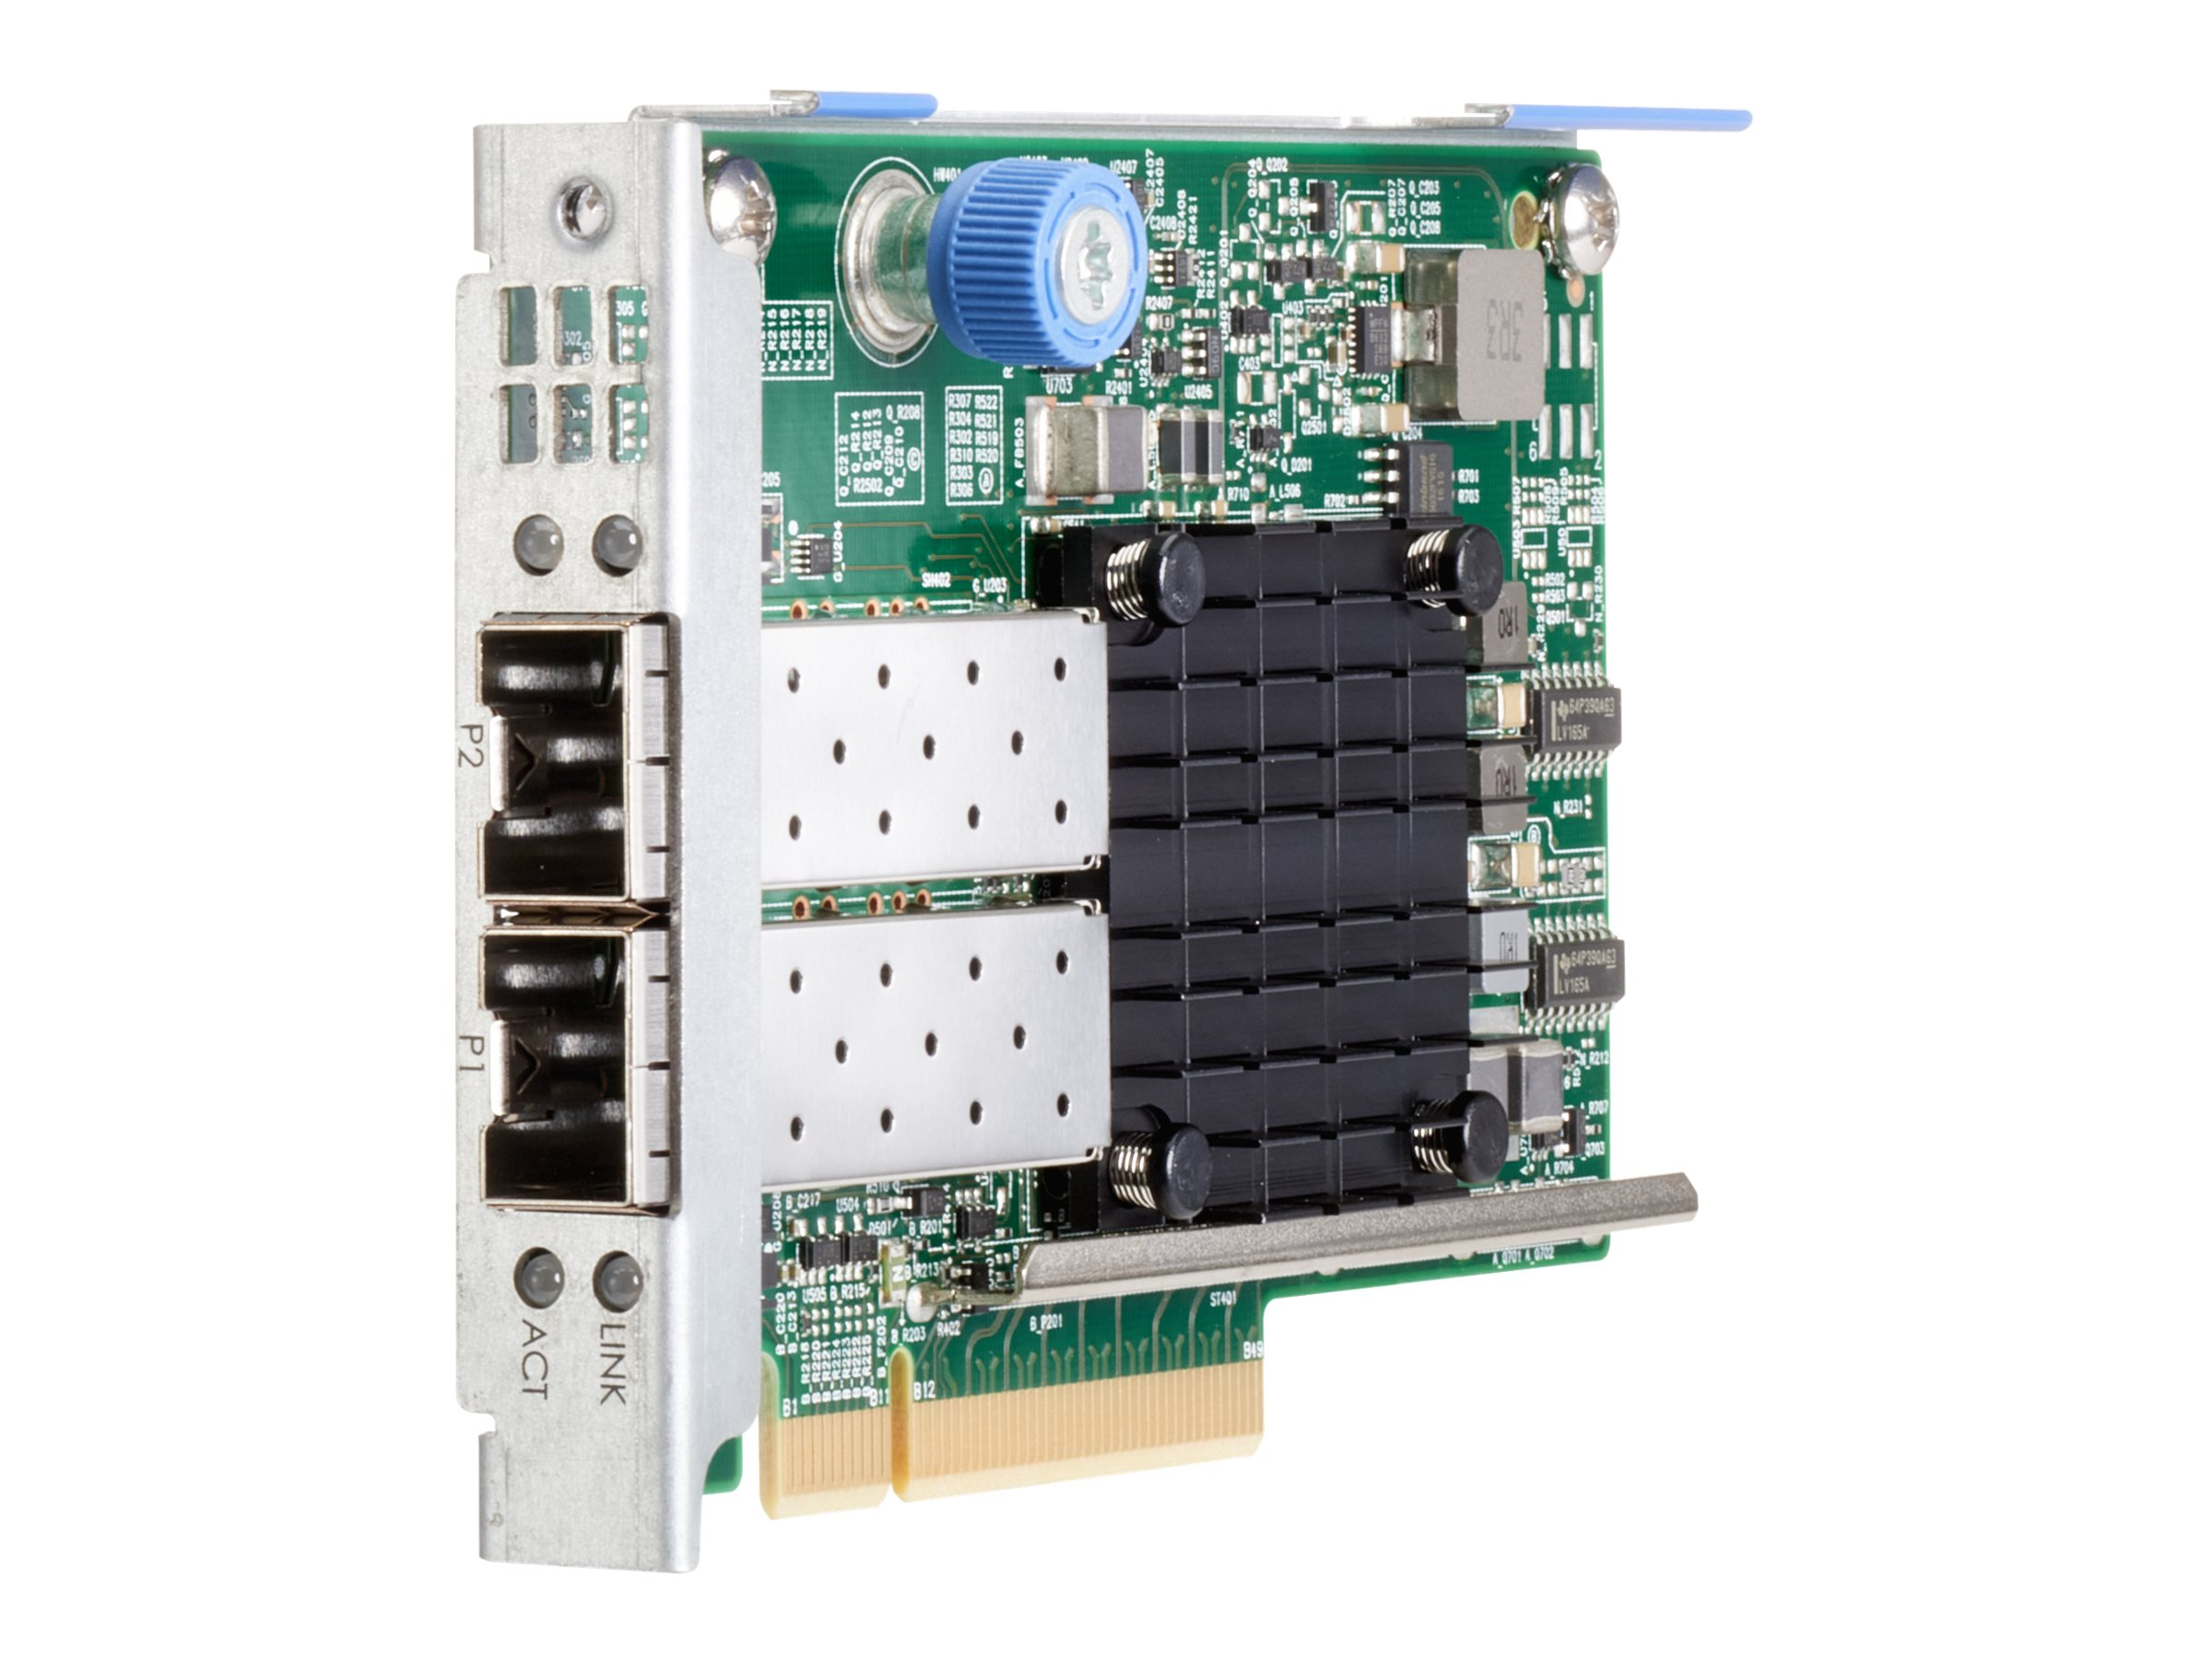 HPE 573SFP+ - network adapter - PCIe 3.0 x8 - 10 Gigabit SFP+ x 2